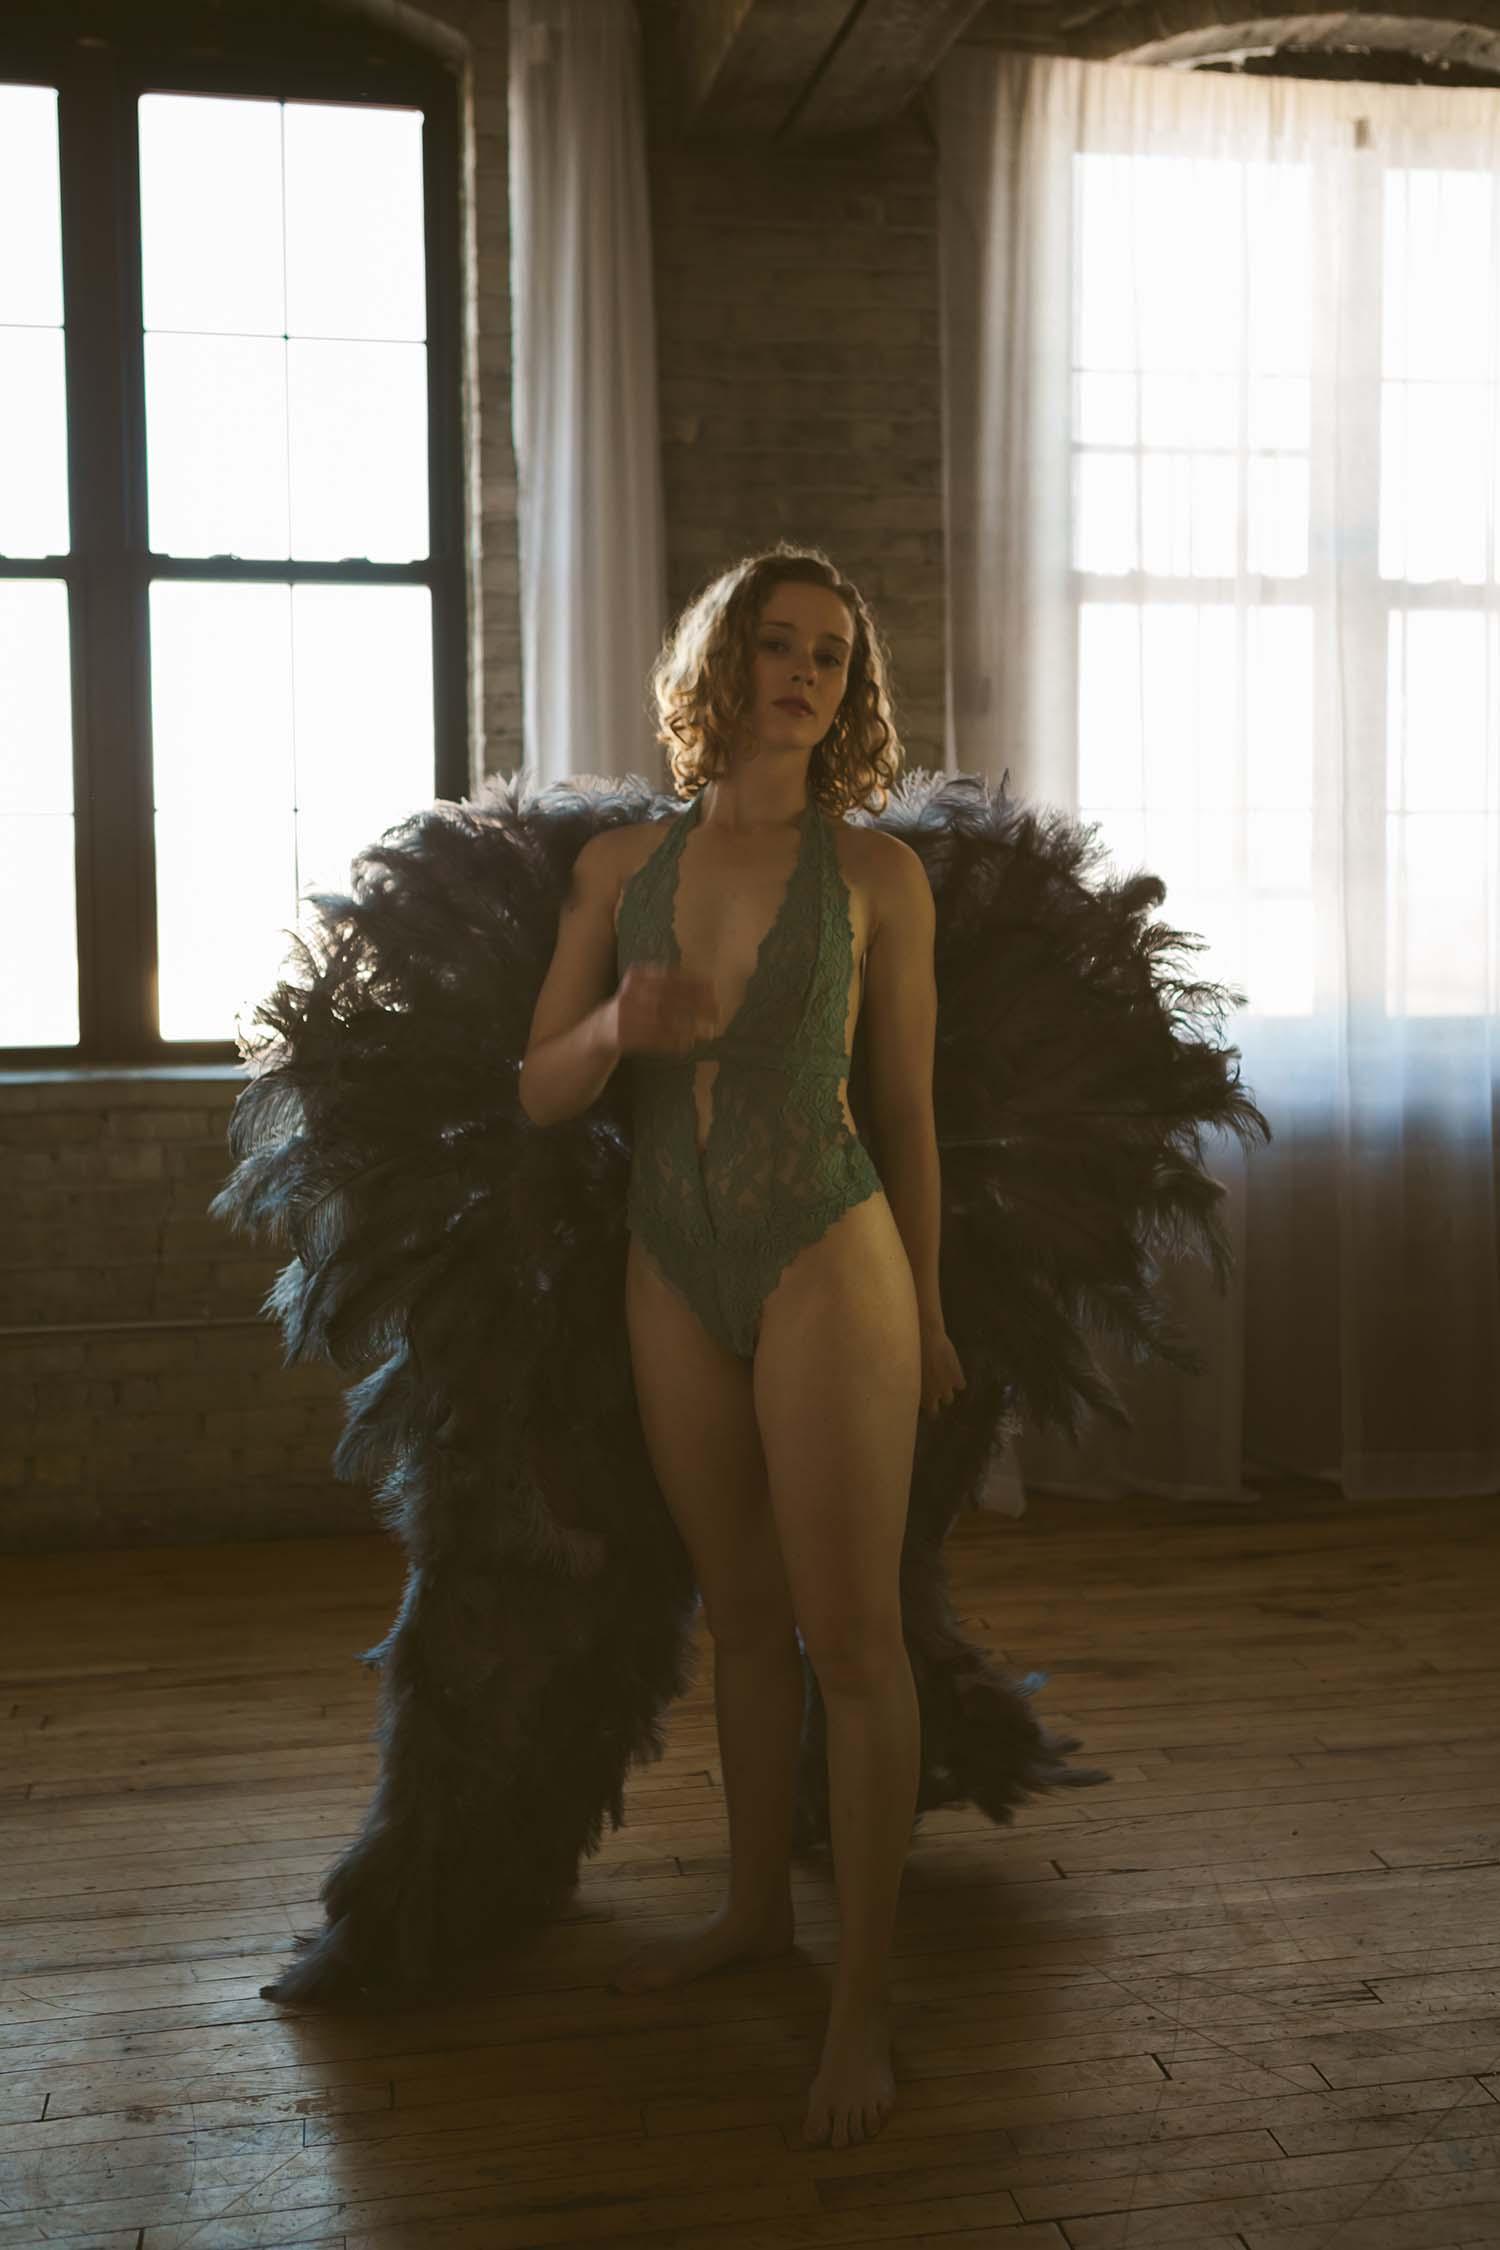 Dar moody  boudoir photo shoot angel wings prop. MN Boudoir photographer